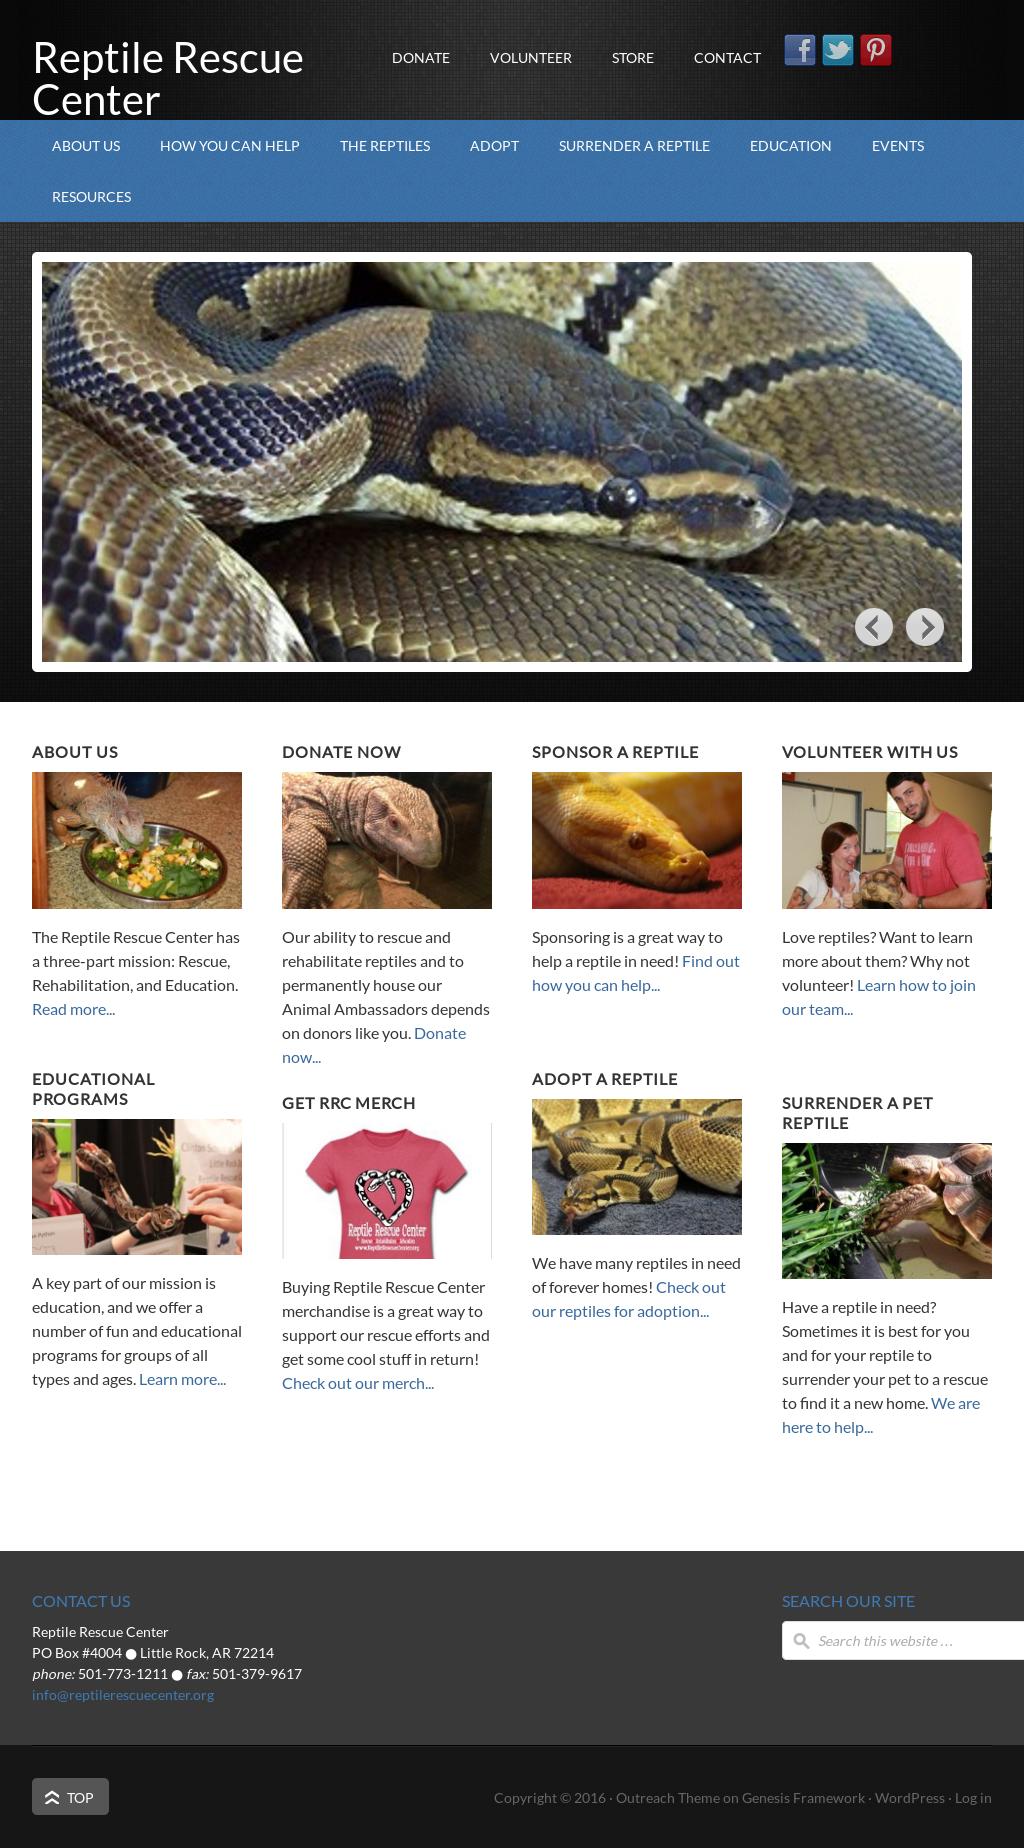 Reptile Rescue Center Competitors, Revenue and Employees